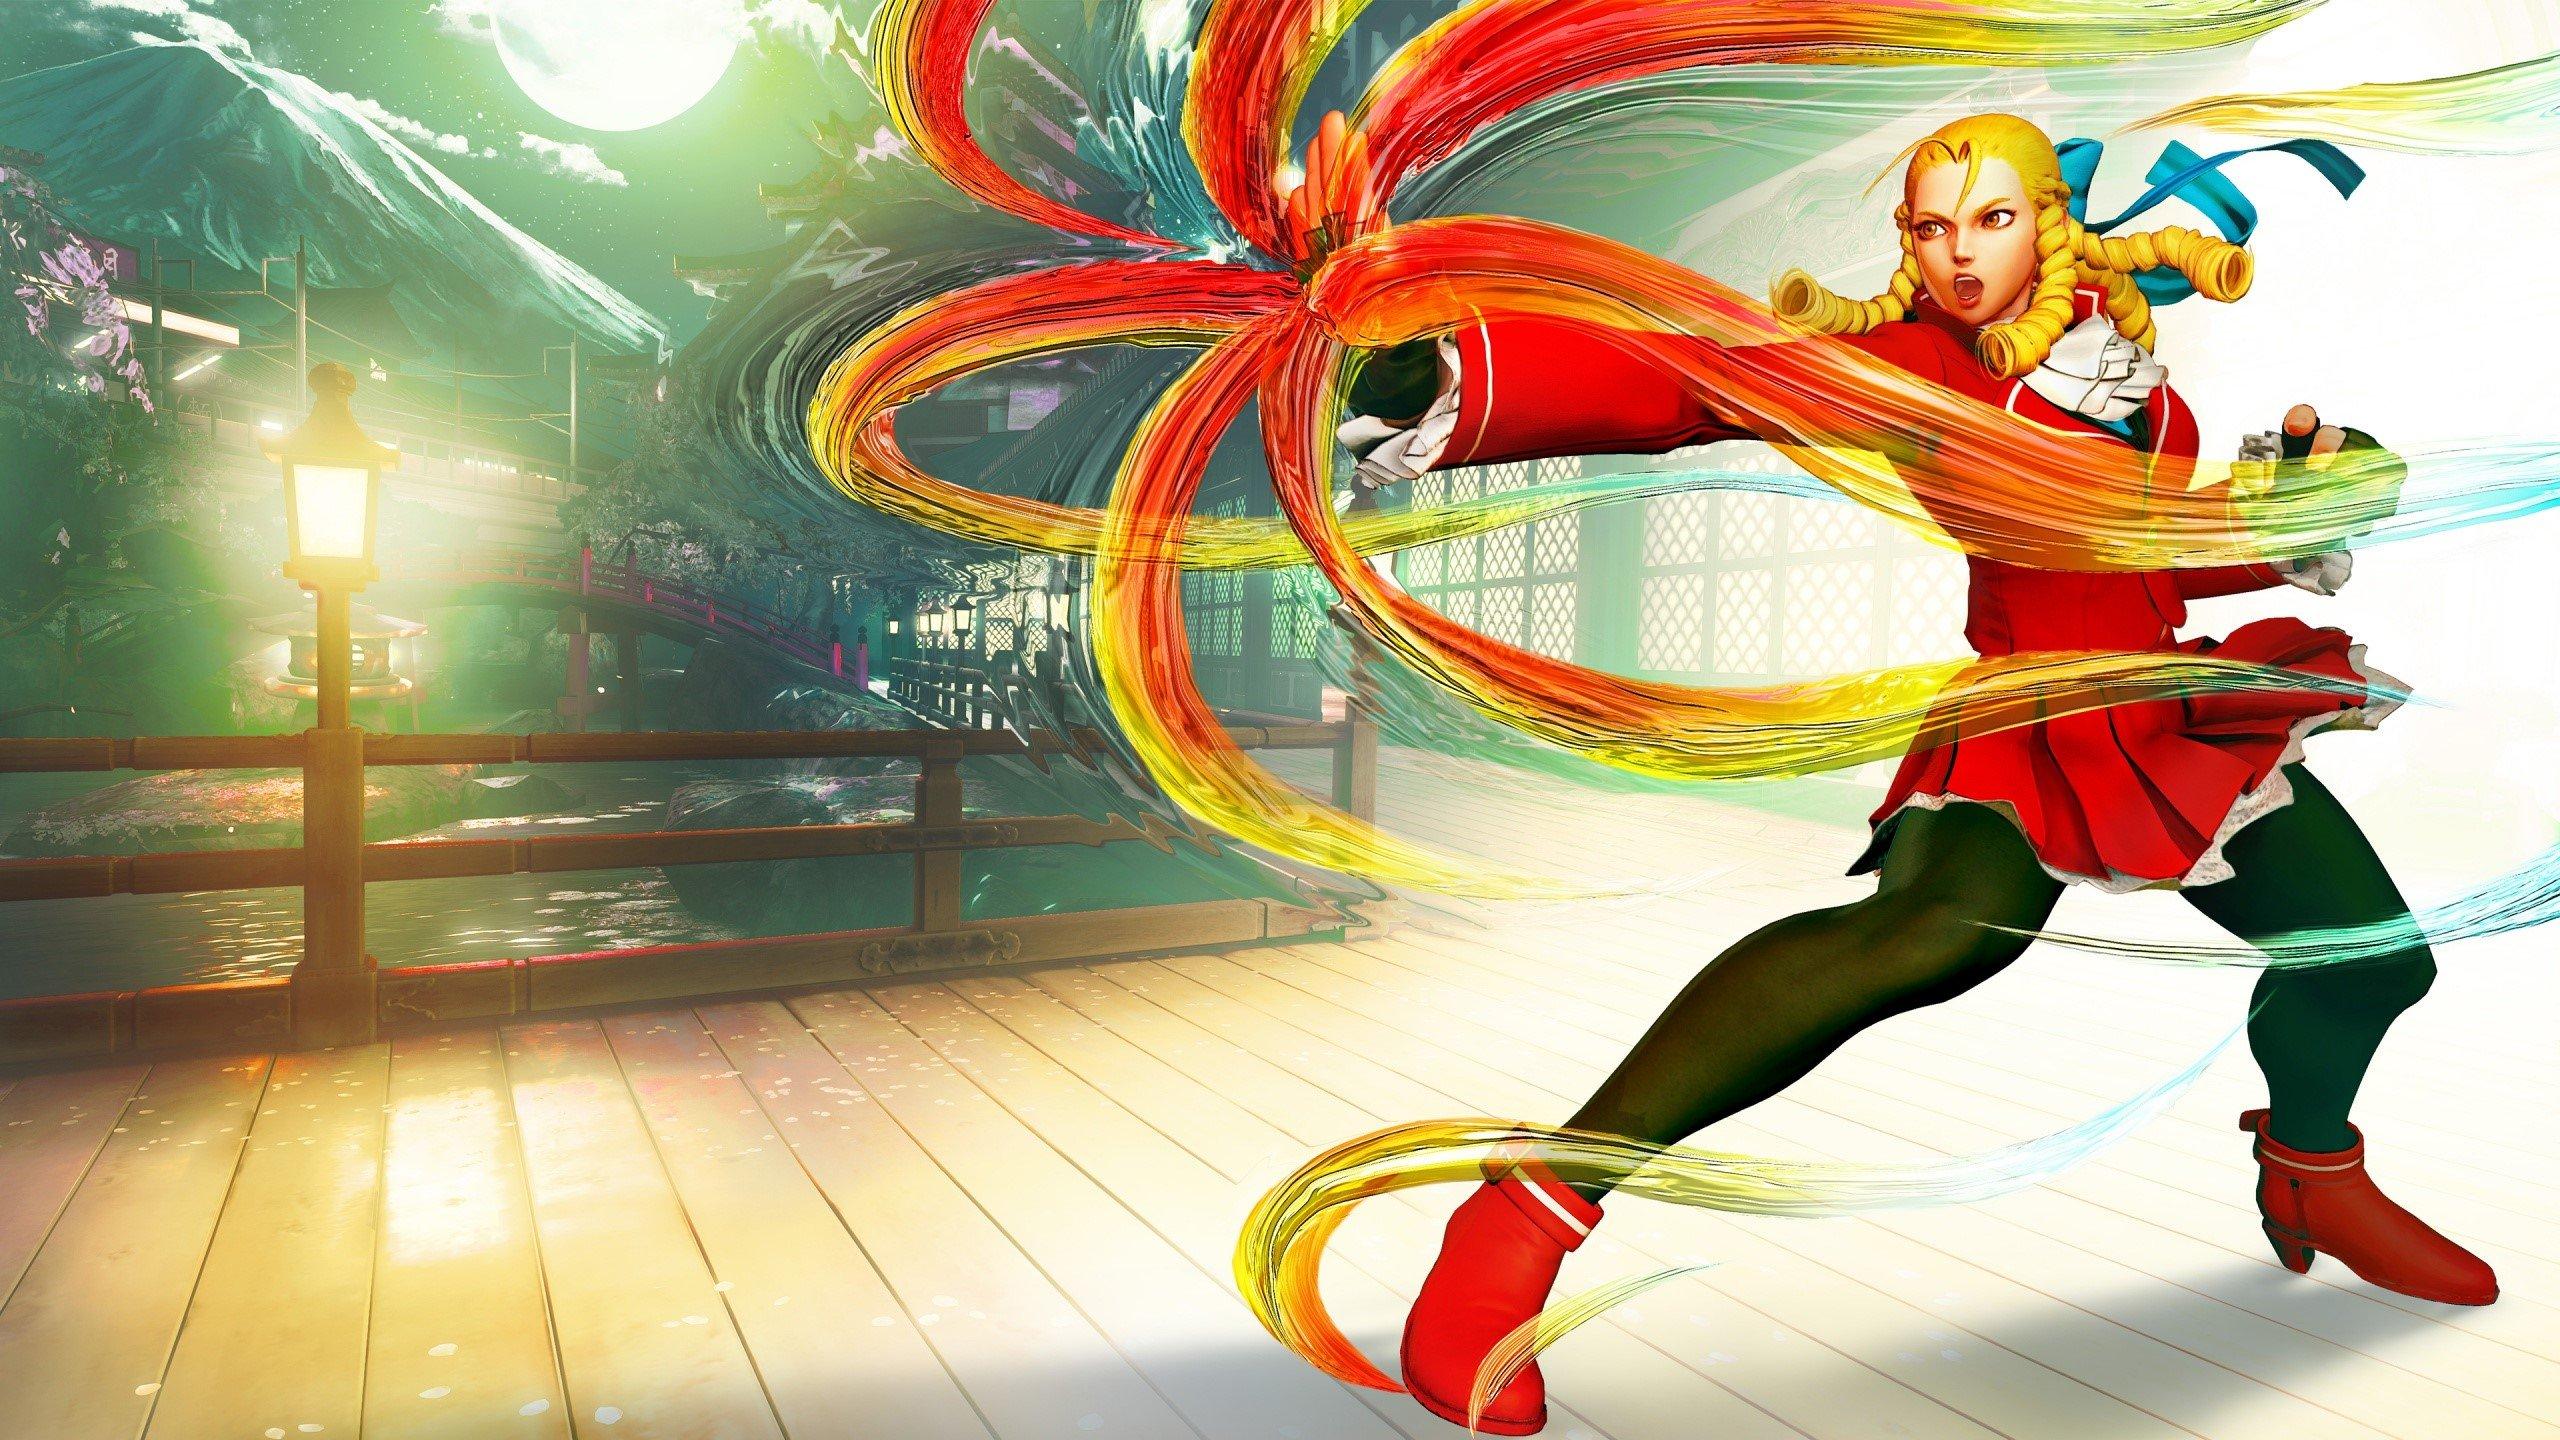 Fondo de pantalla de Karin de Street fighter V Imágenes